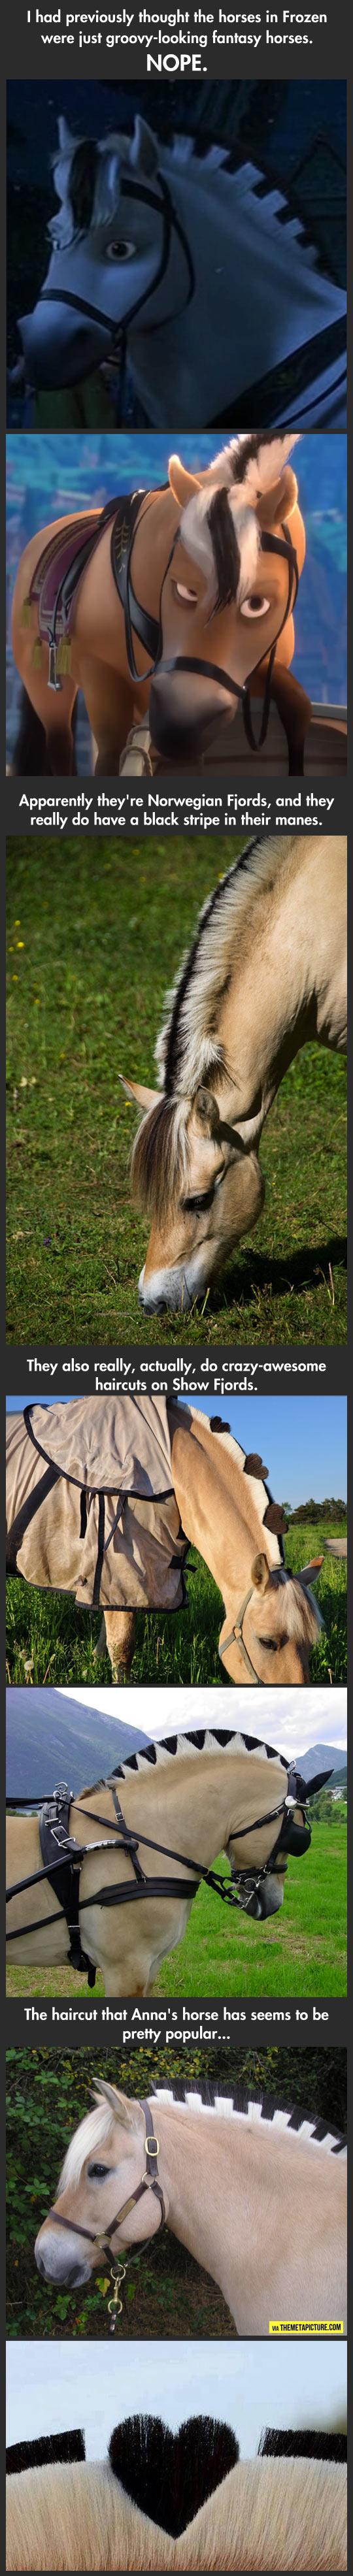 funny-horses-Frozen-cute-haircut